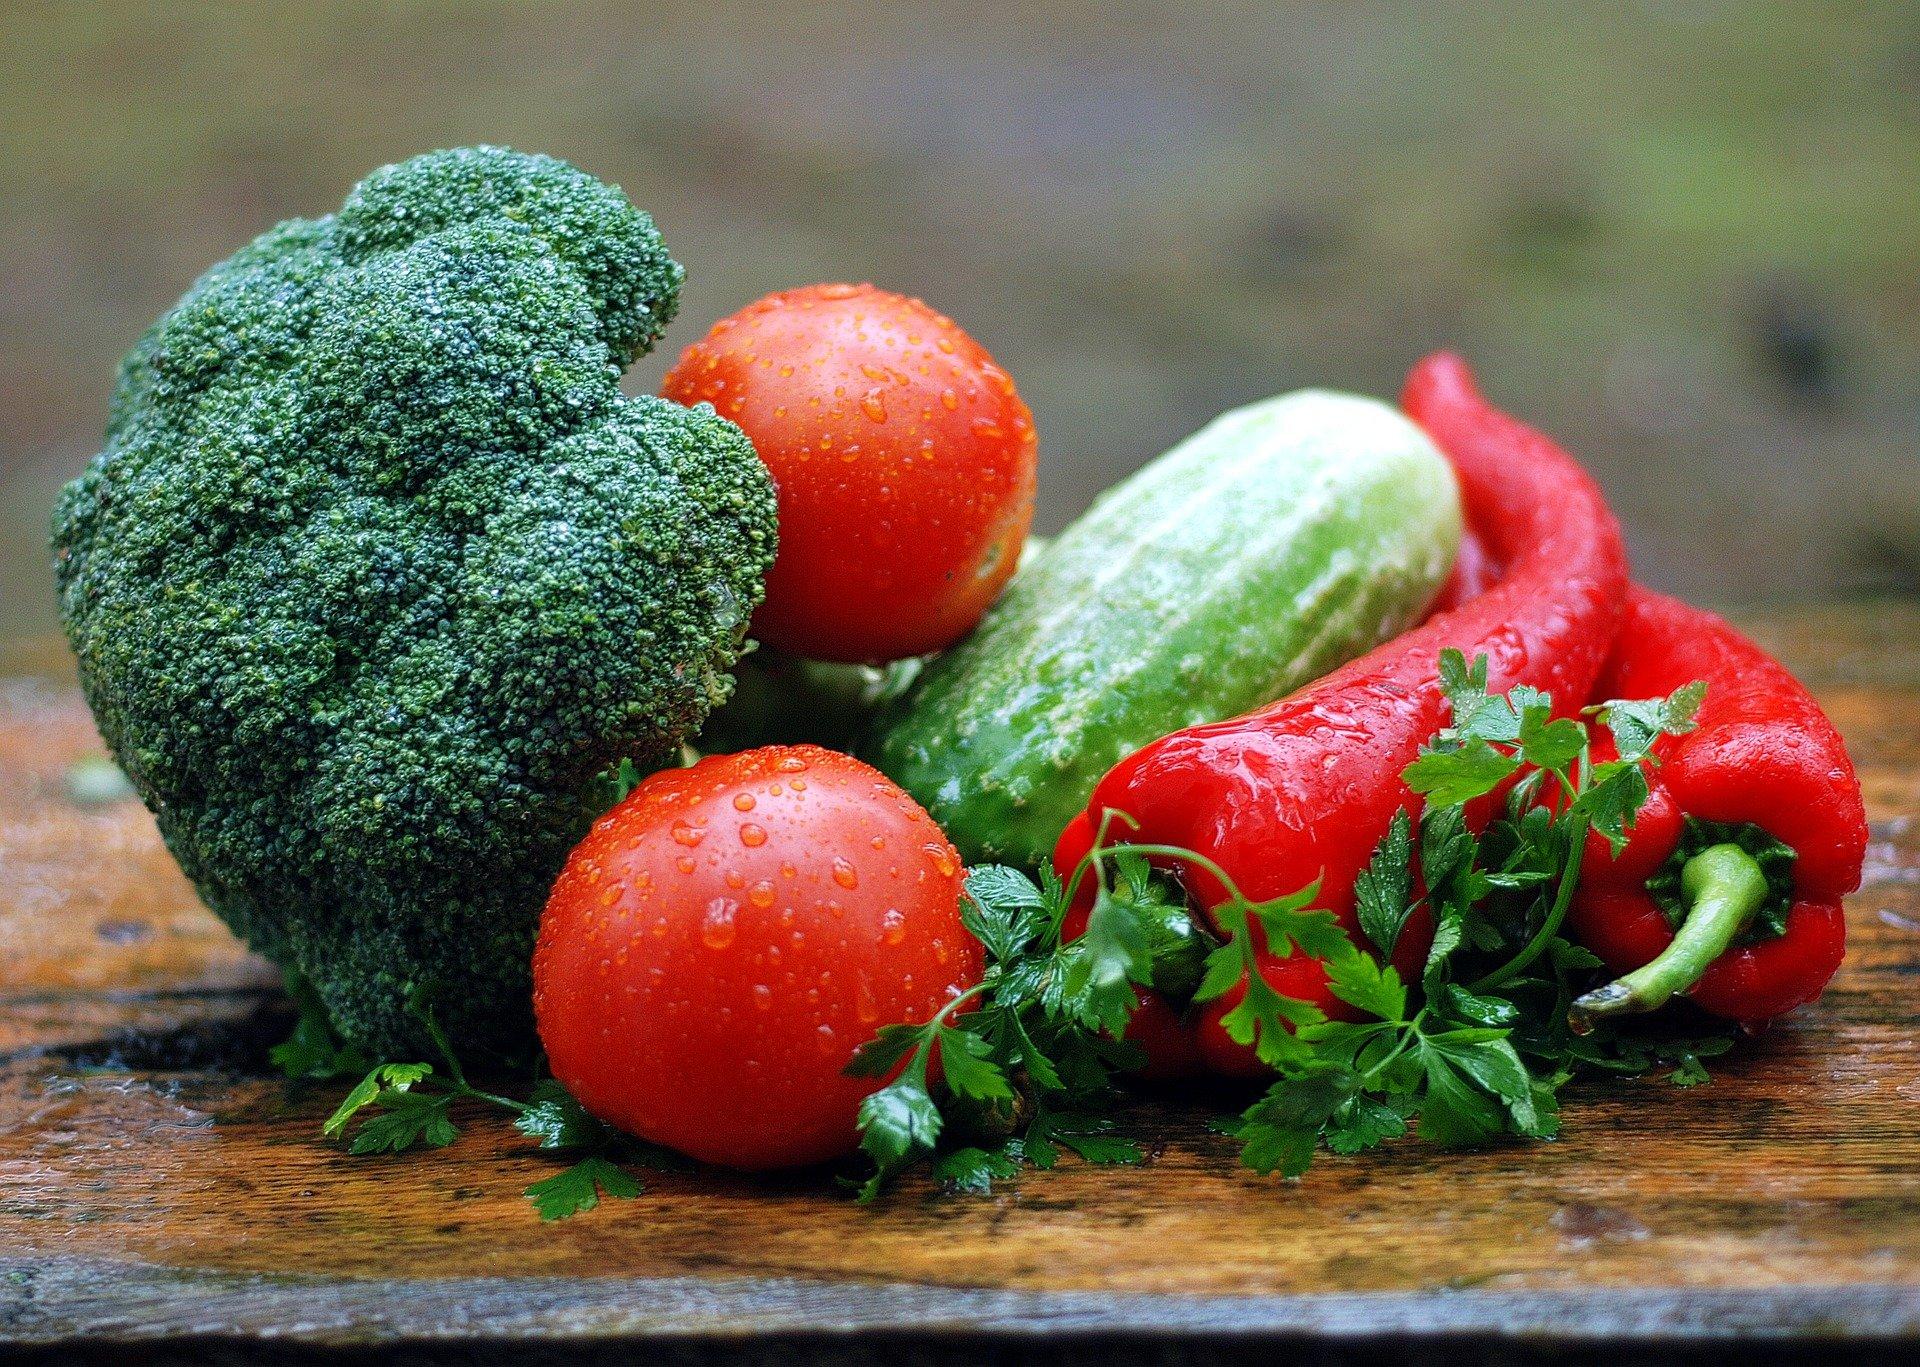 hiilihydraatit kasviksista